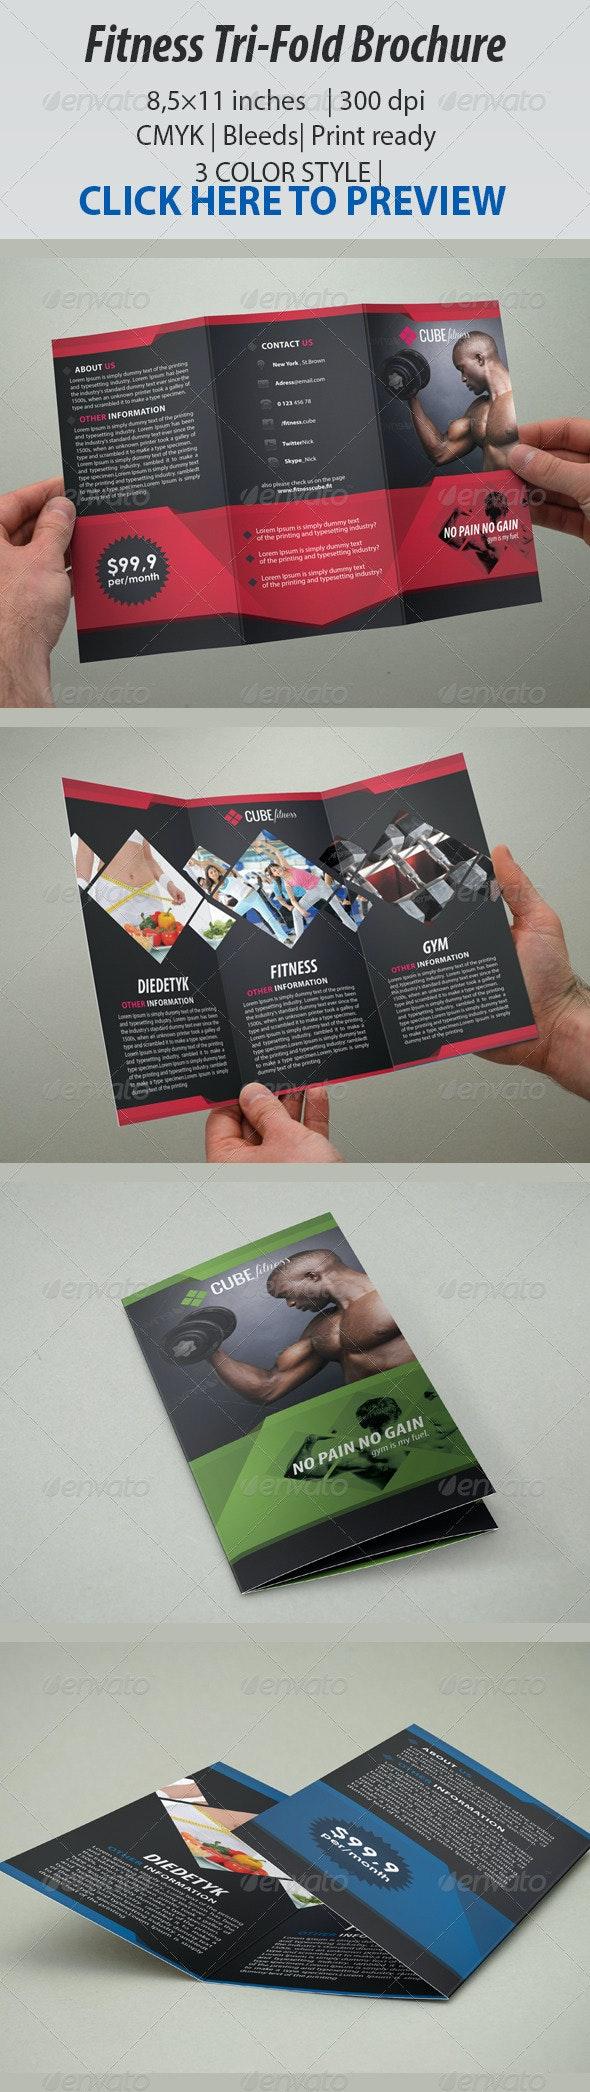 Fitness Brochure Tri-Fold - Corporate Brochures